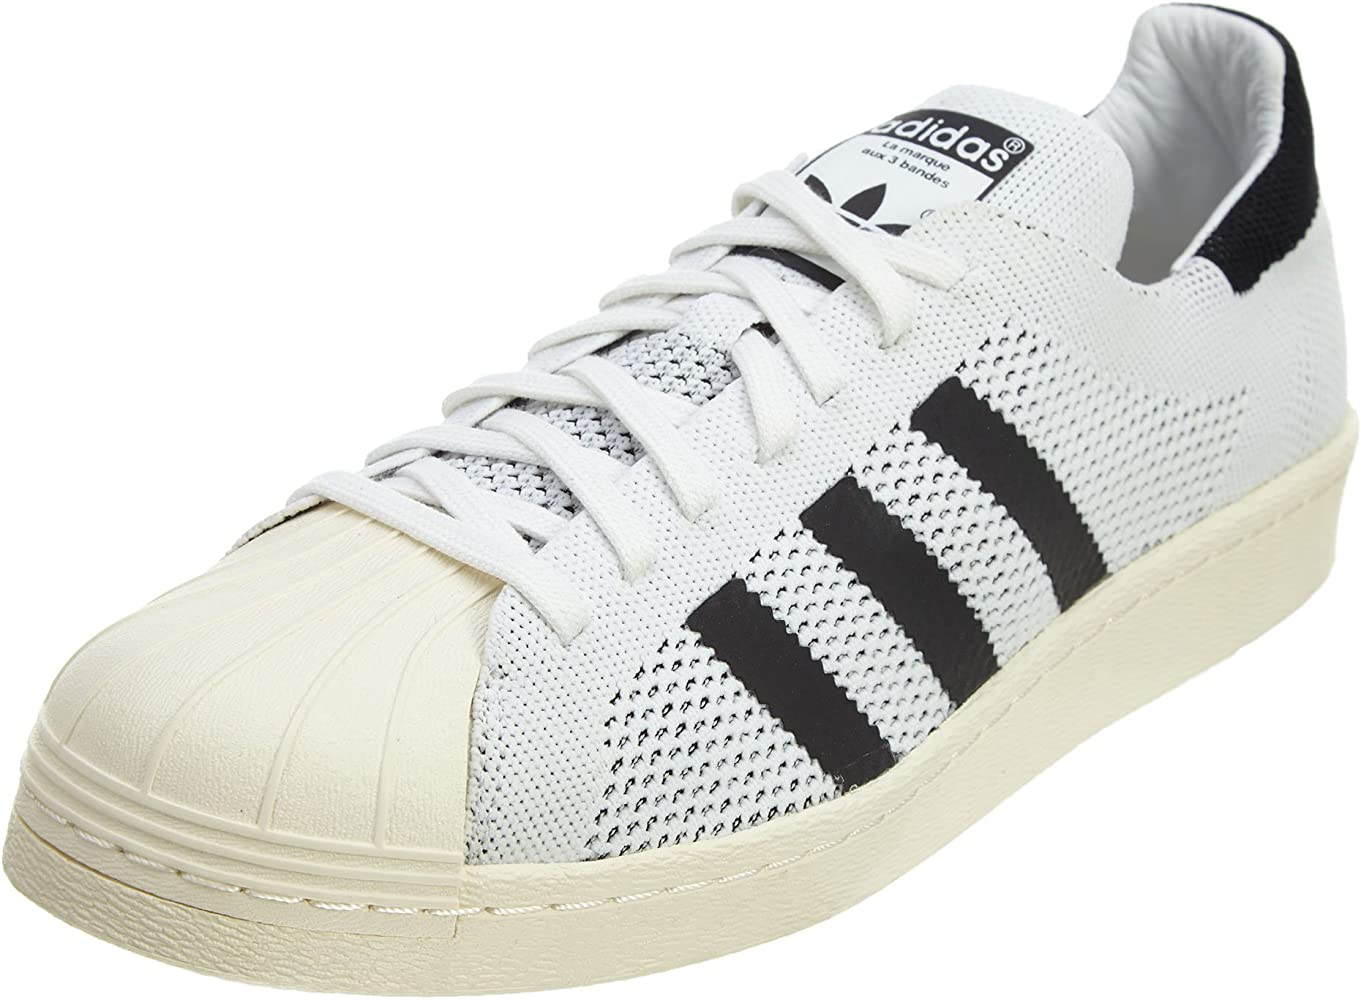 adidas Originals Mens Superstar 80s Primeknit Low Top Lifestyle Fashion Sneakers